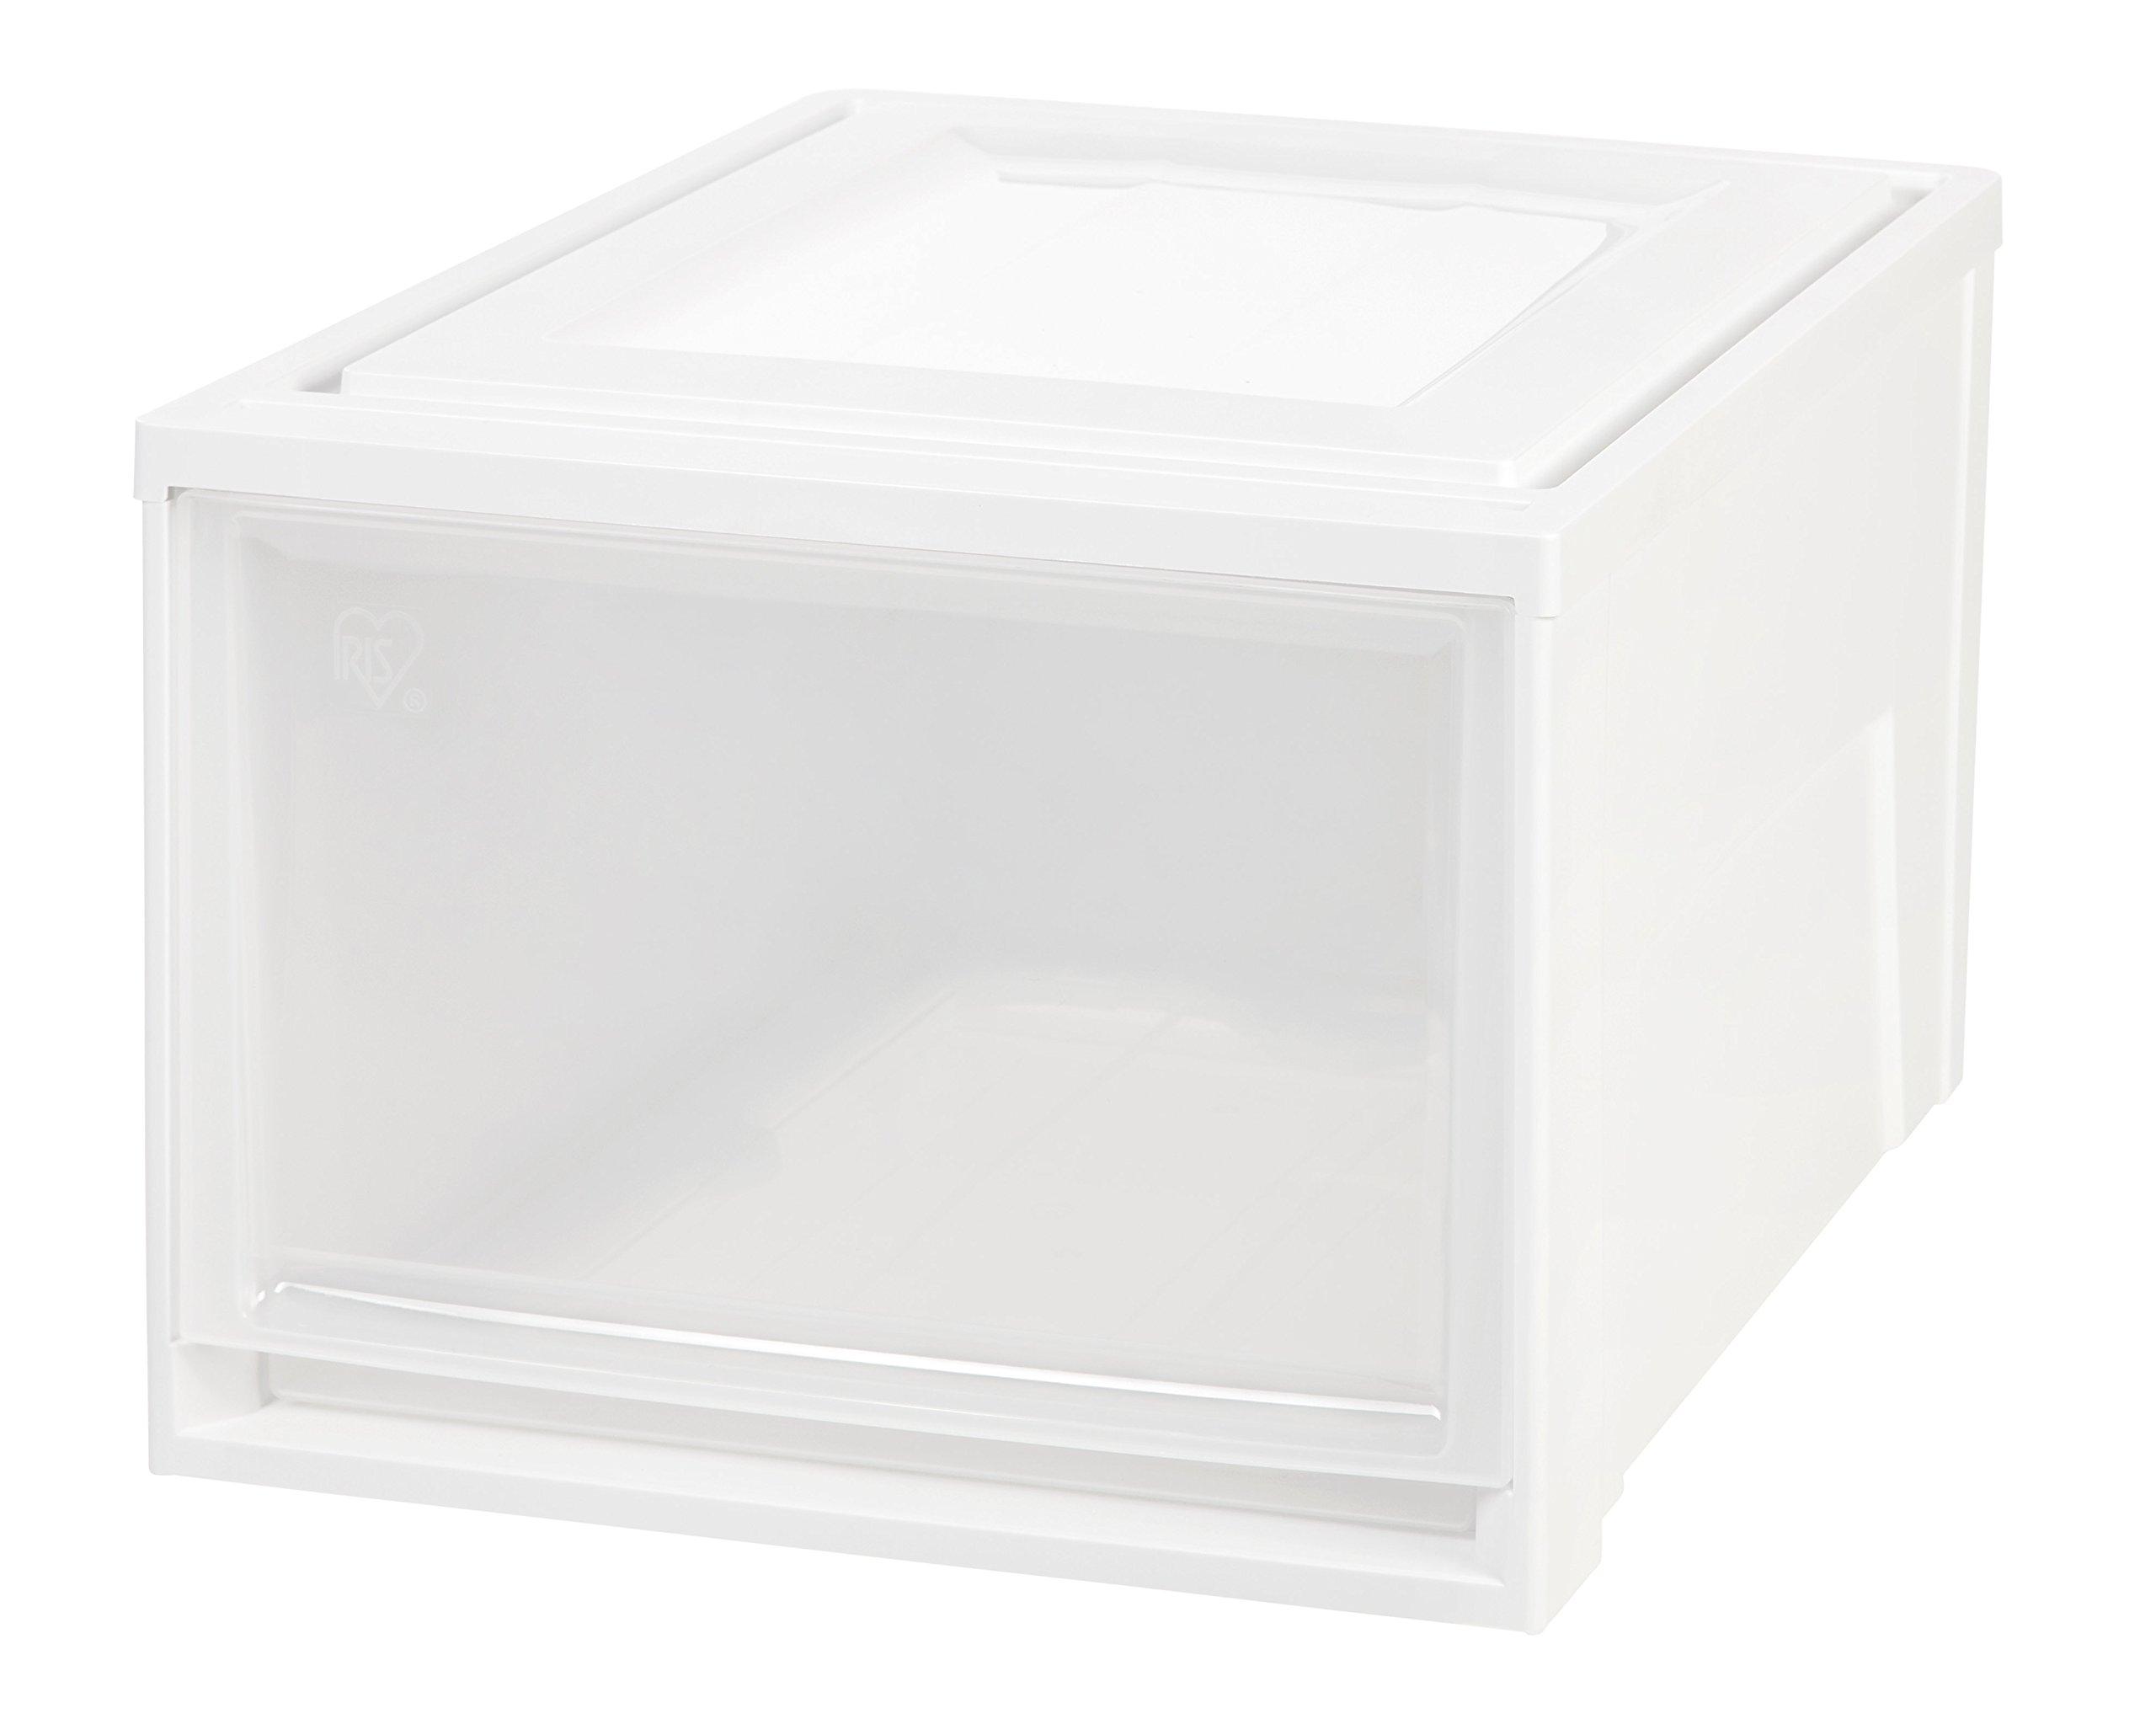 IRIS Deep Box Chest Drawer, White, 3 Pack by IRIS USA, Inc.